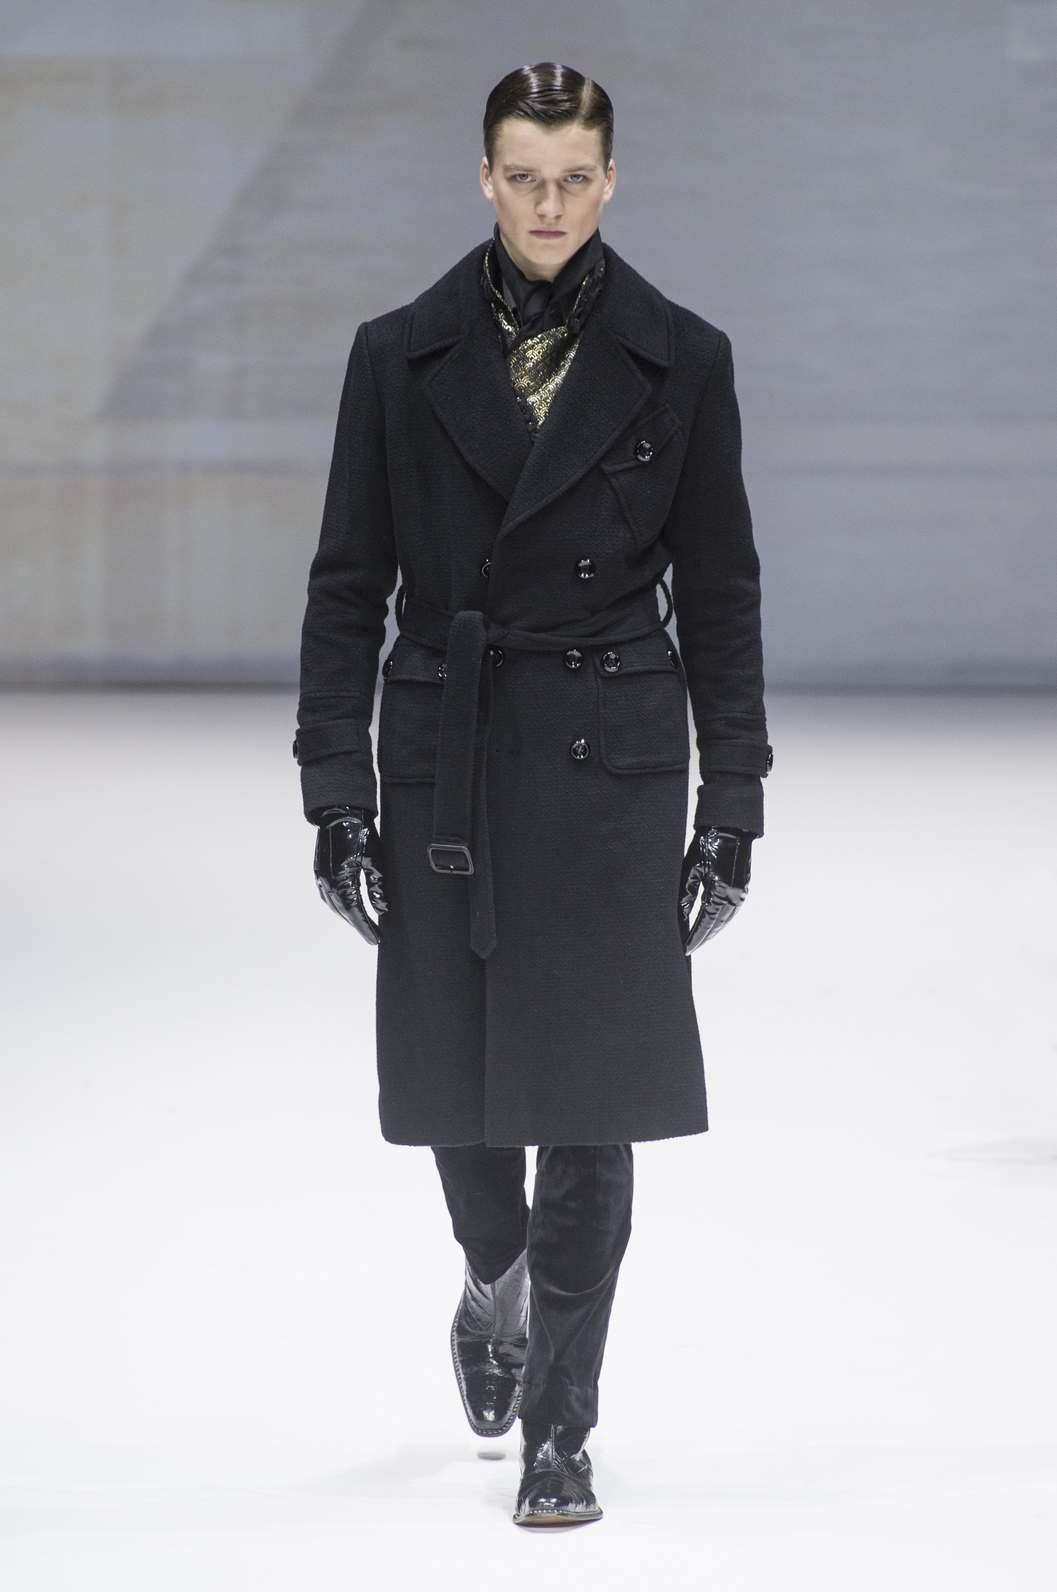 Malan Breton Fall-Winter 2017 - New York Fashion Week